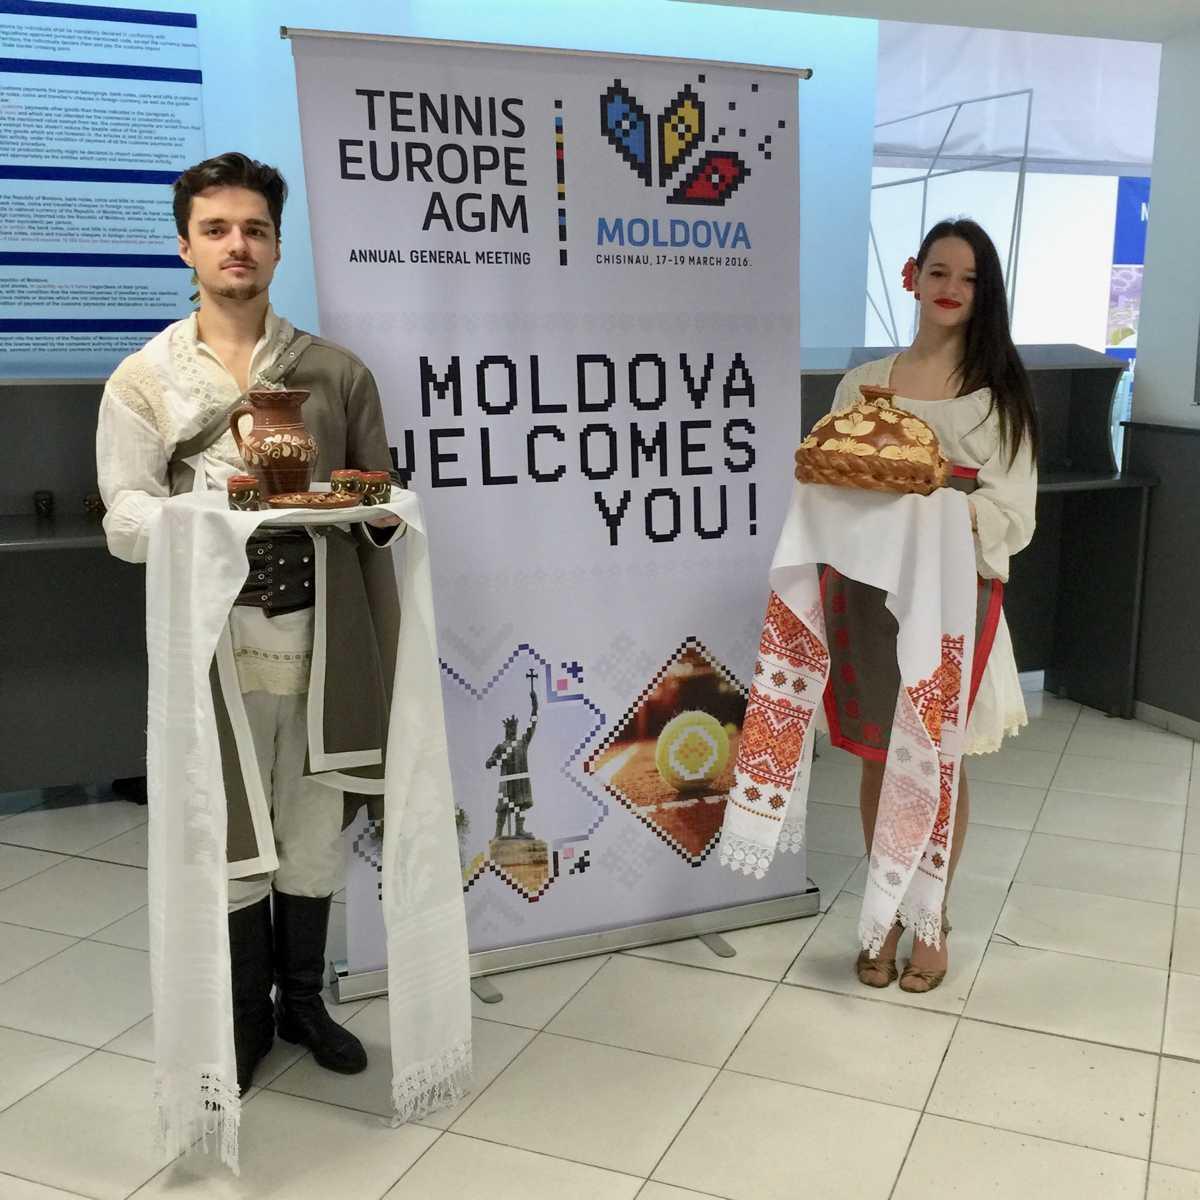 Image - tours in moldova